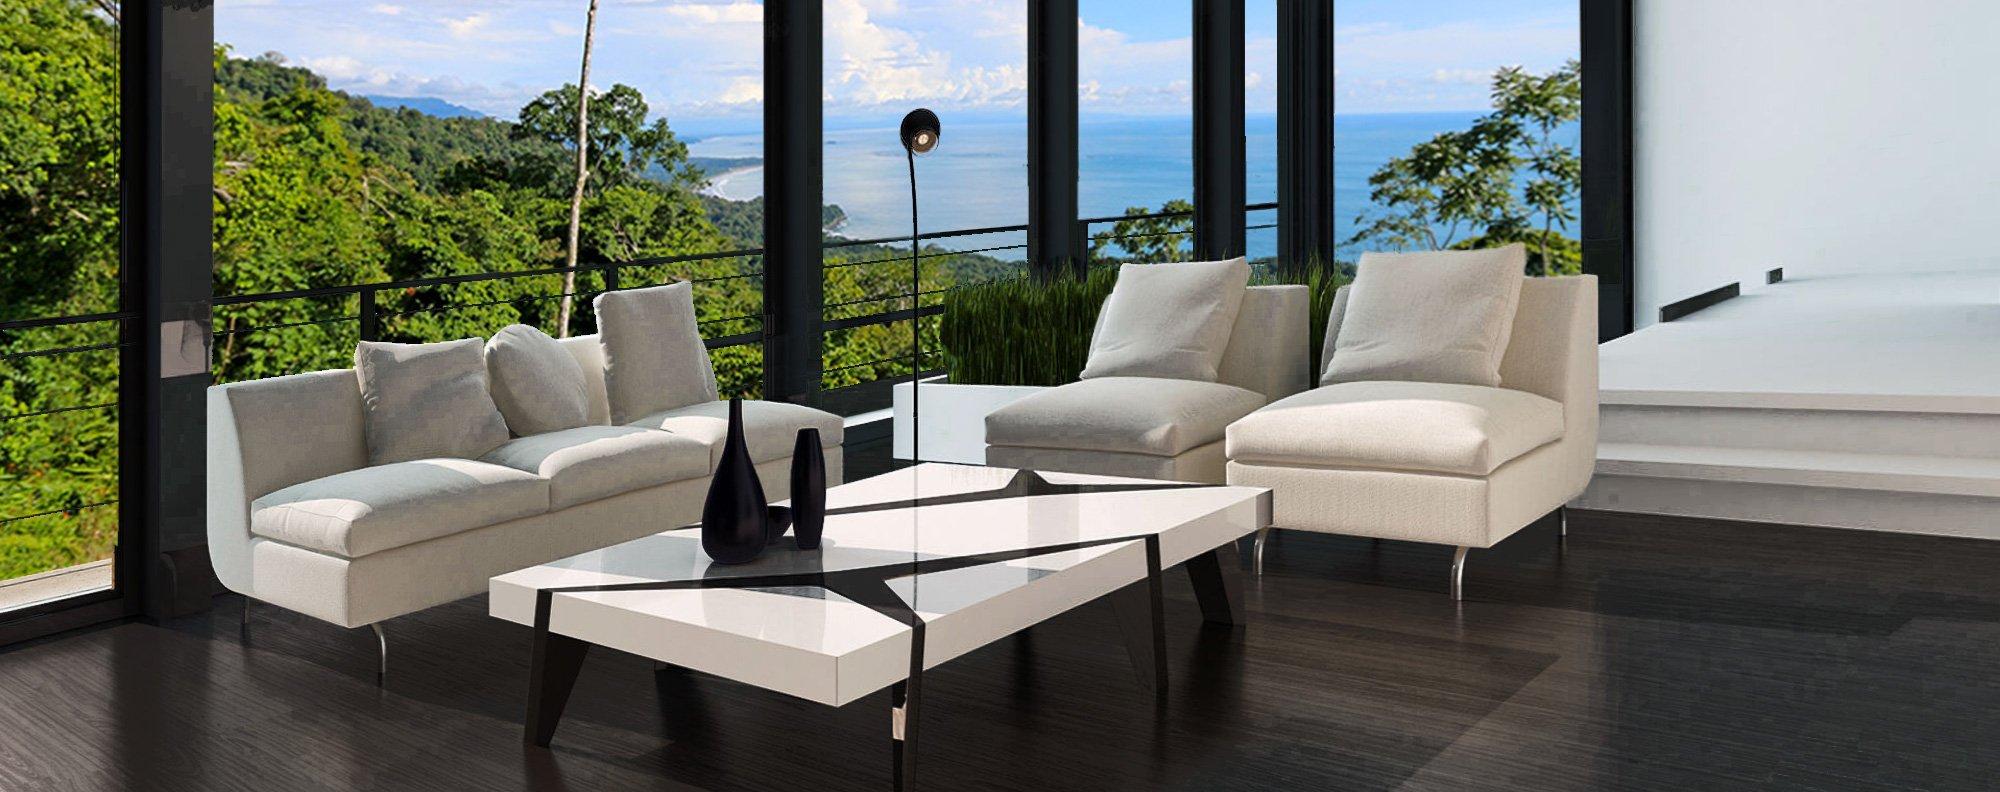 Inmobiliaria En Costa Rica Properties for sale in Samara Costa Rica Home with great ocean view.